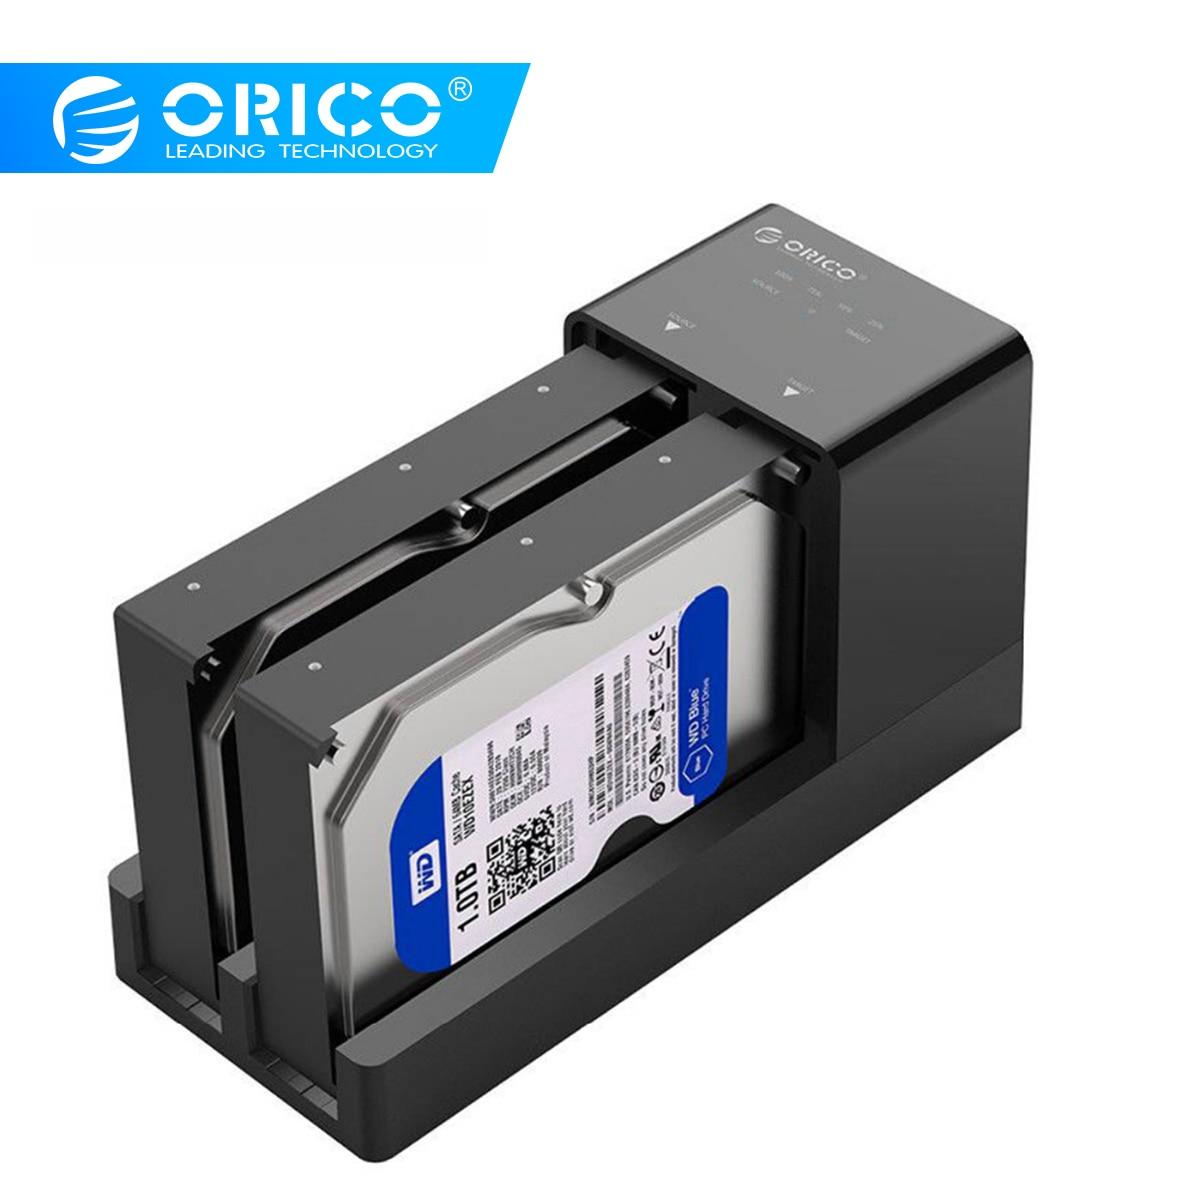 ORICO 2.5 3.5 SATA HDD Enclosure Docking Station Offline Clone Super Speed USB 3.0 Hard Drive Support 10TB 2 Bay black 6528US3-C